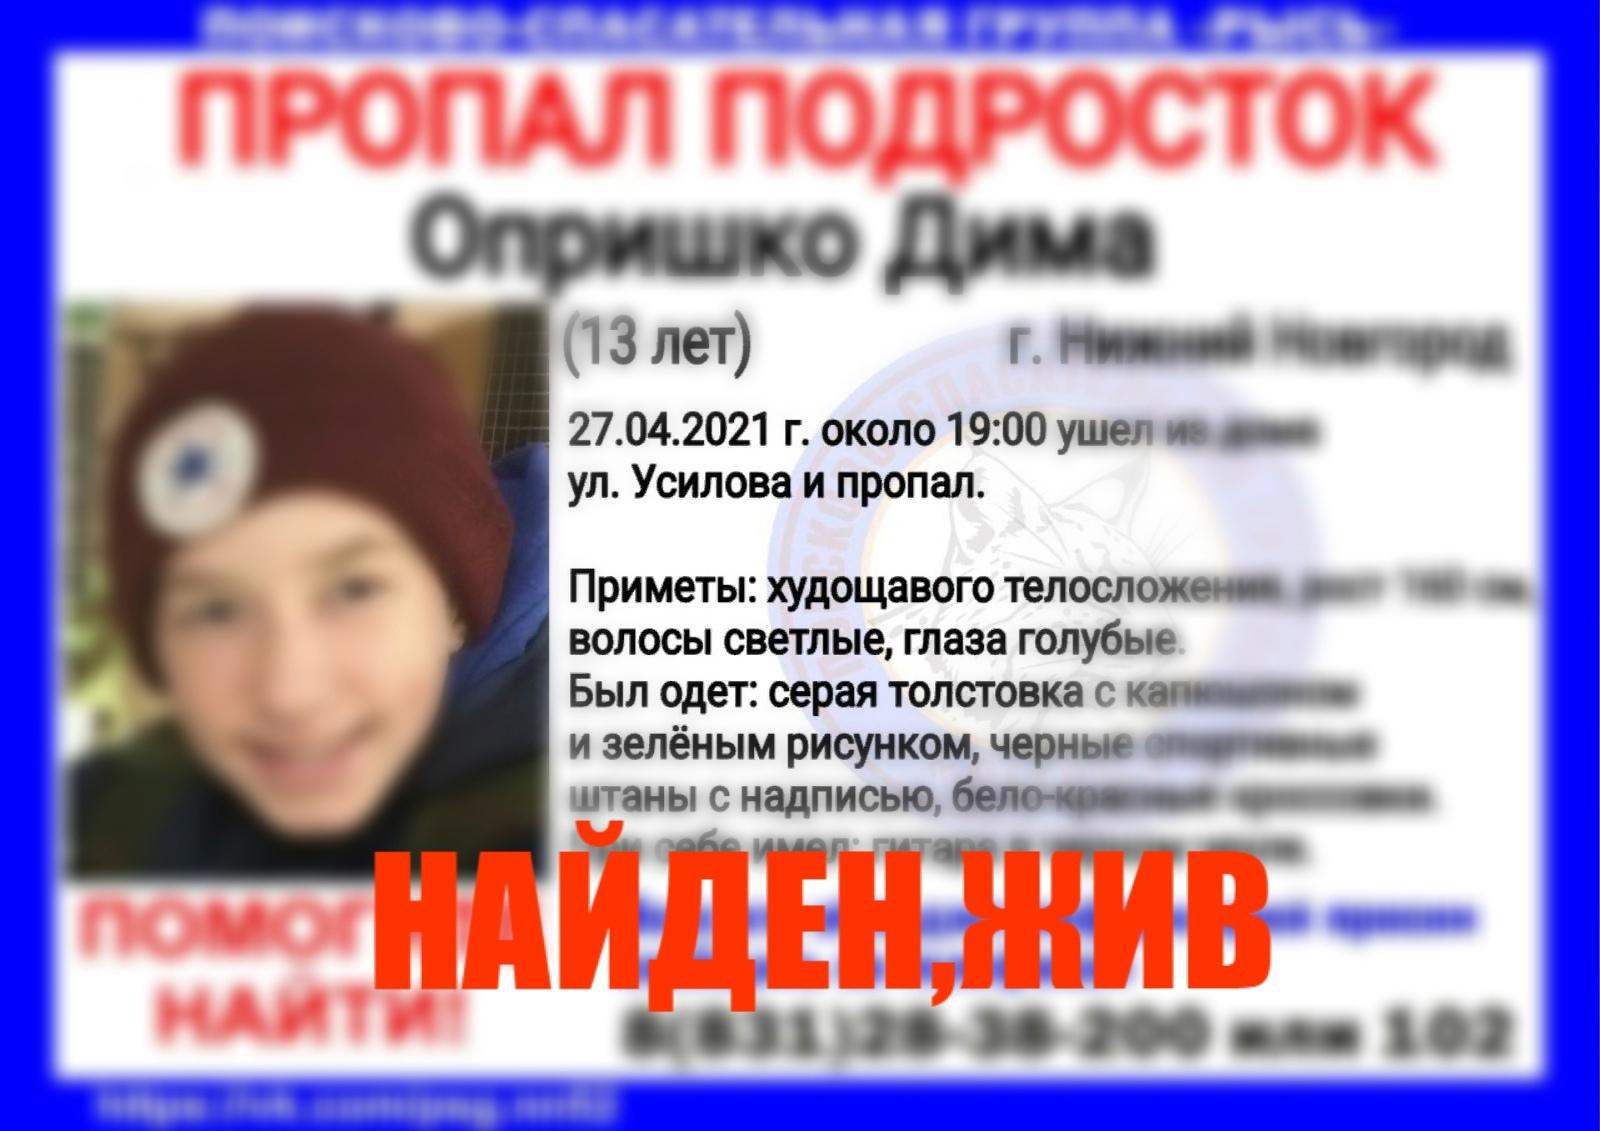 Опришко Дима, 13 лет г. Нижний Новгород